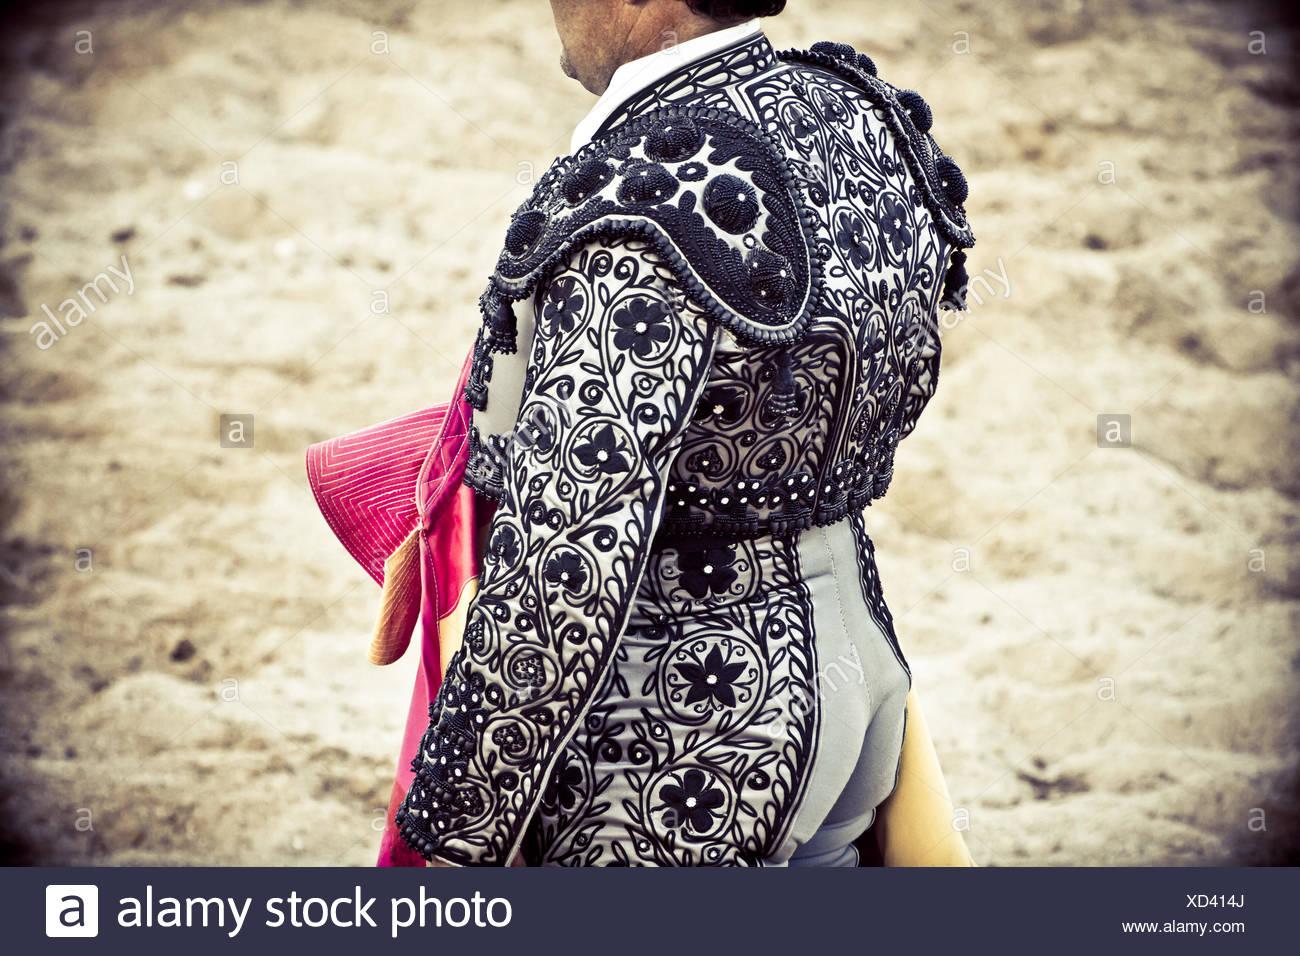 bullfighters costumes - Stock Image